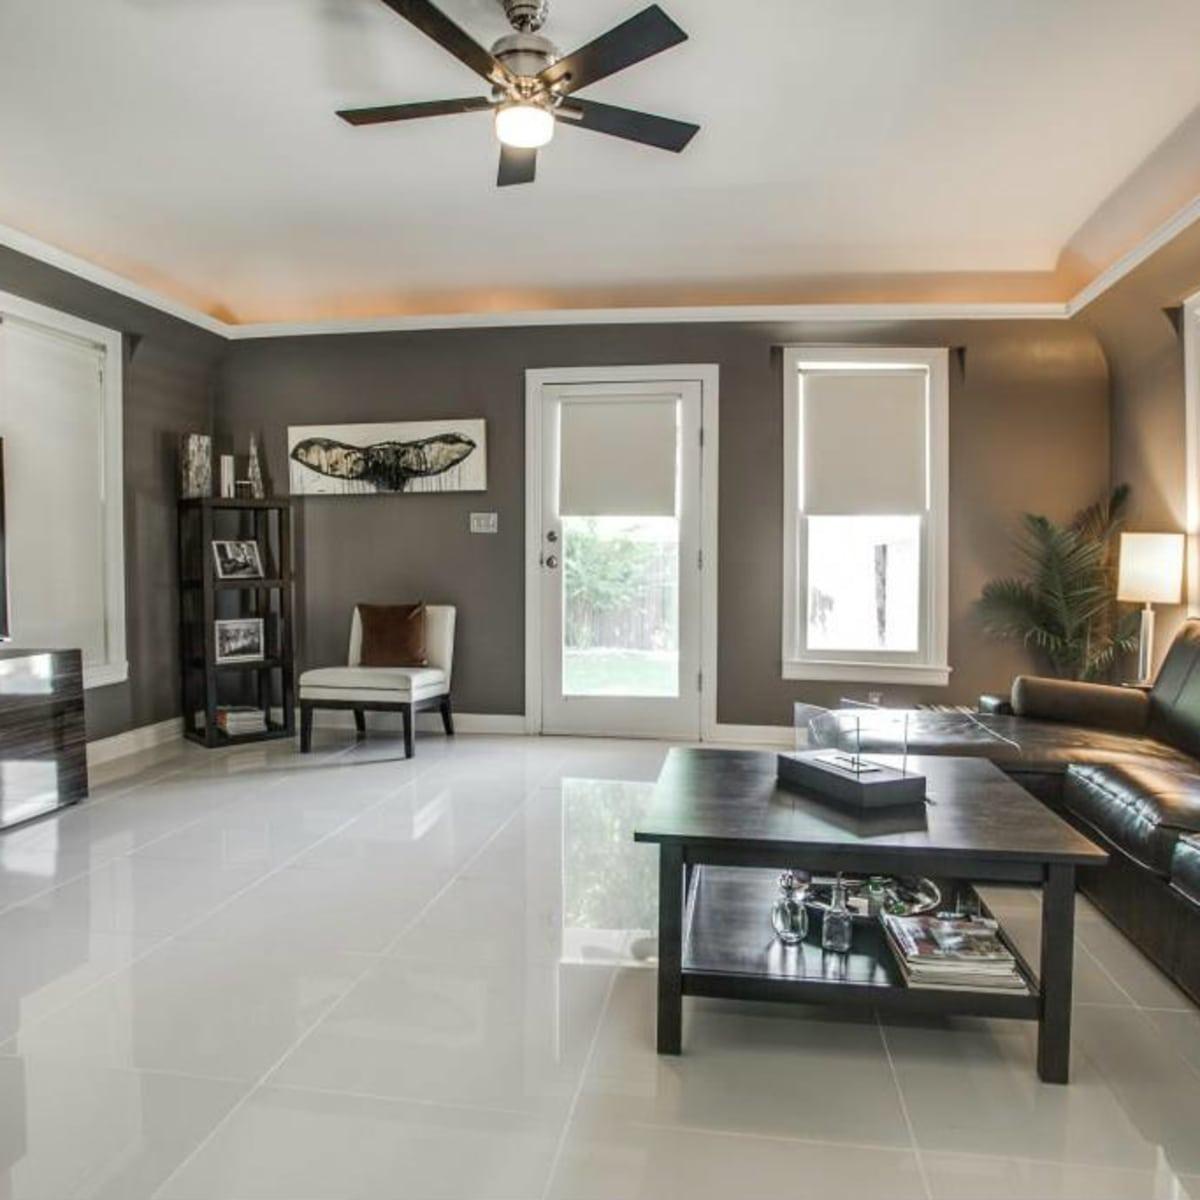 Living room at 114 N. Edgefield in Dallas